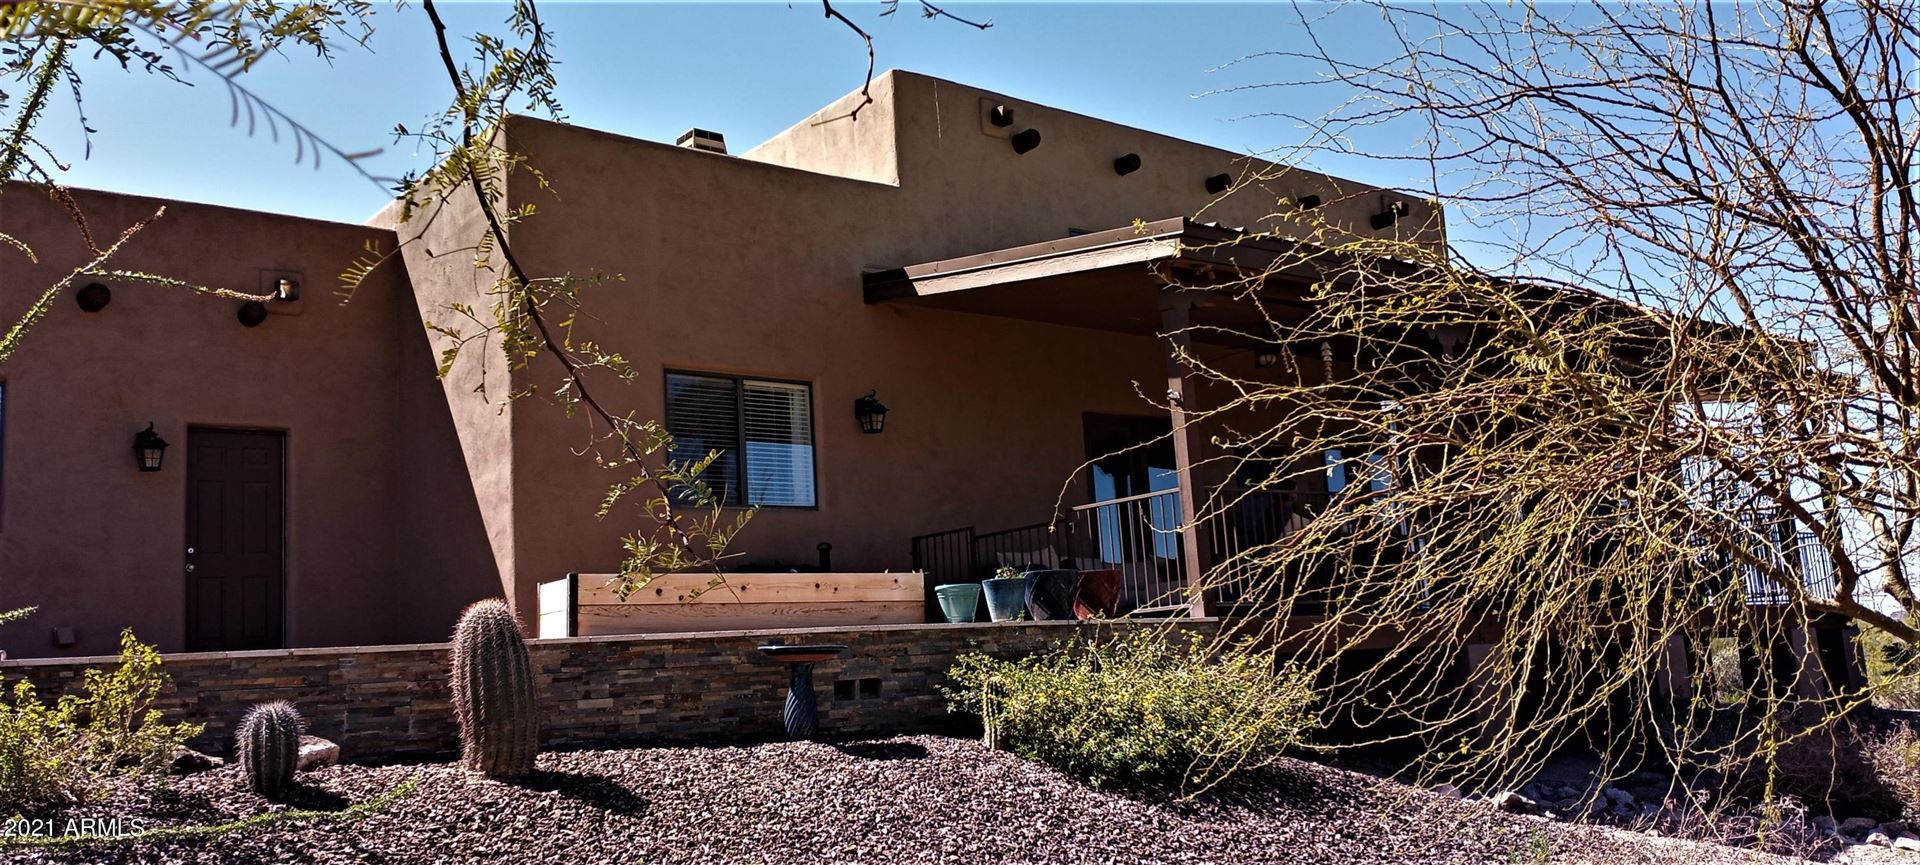 Photo of 235 W RIDGECREST Road, Desert Hills, AZ 85086 (MLS # 6212808)